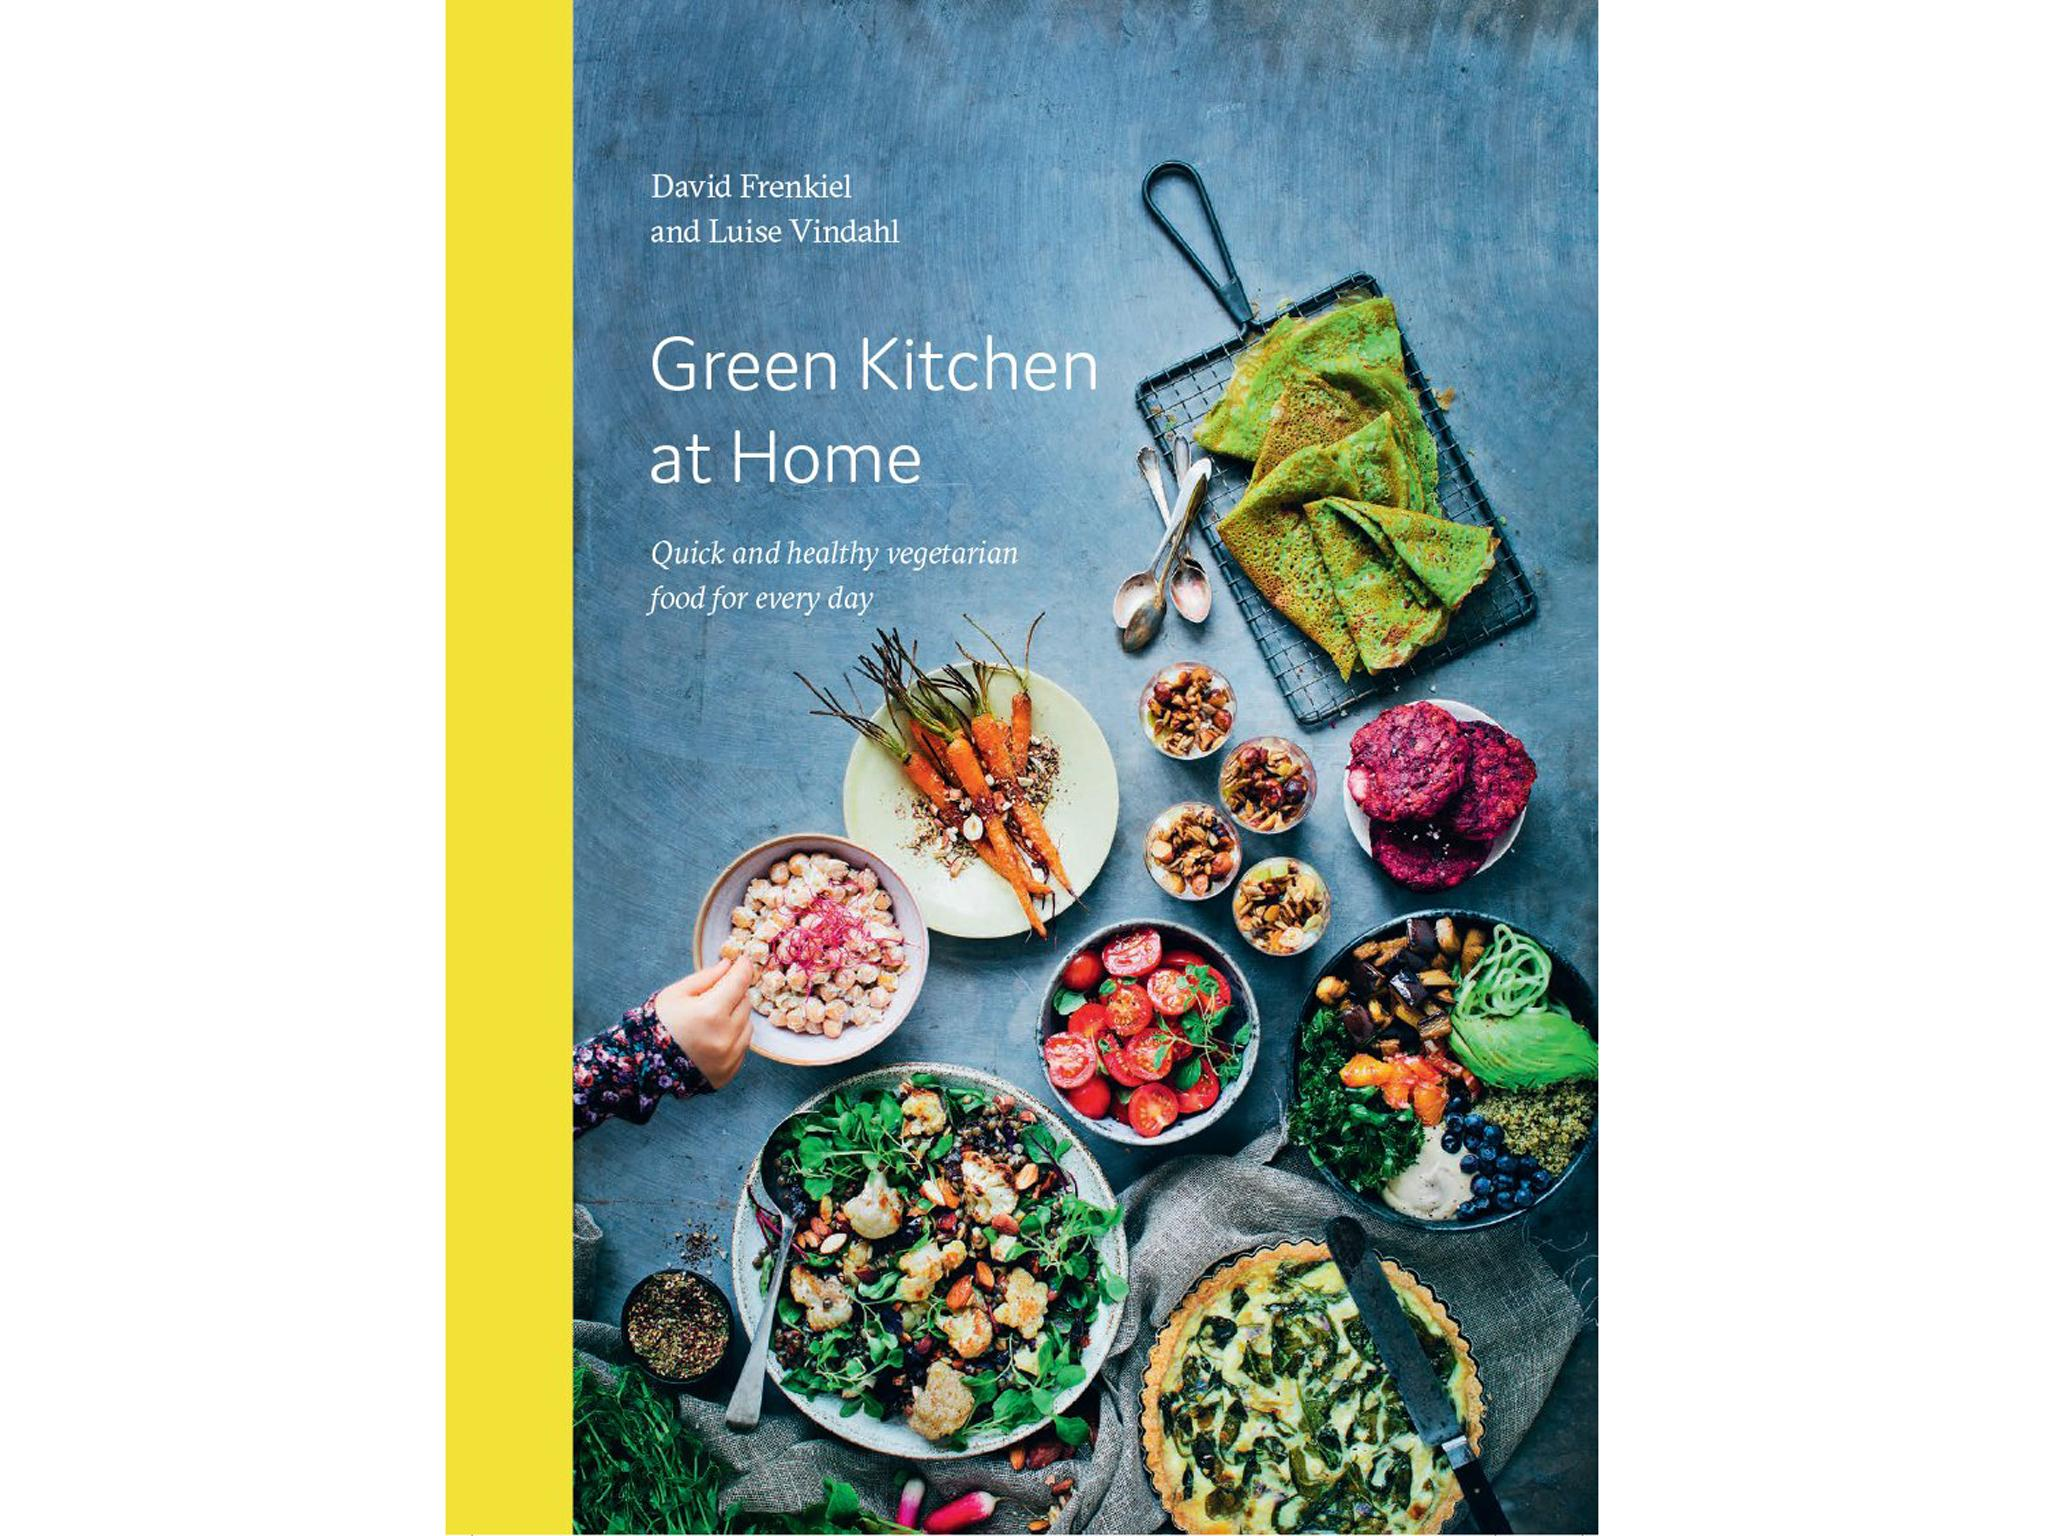 14 best vegetarian cookbooks | The Independent